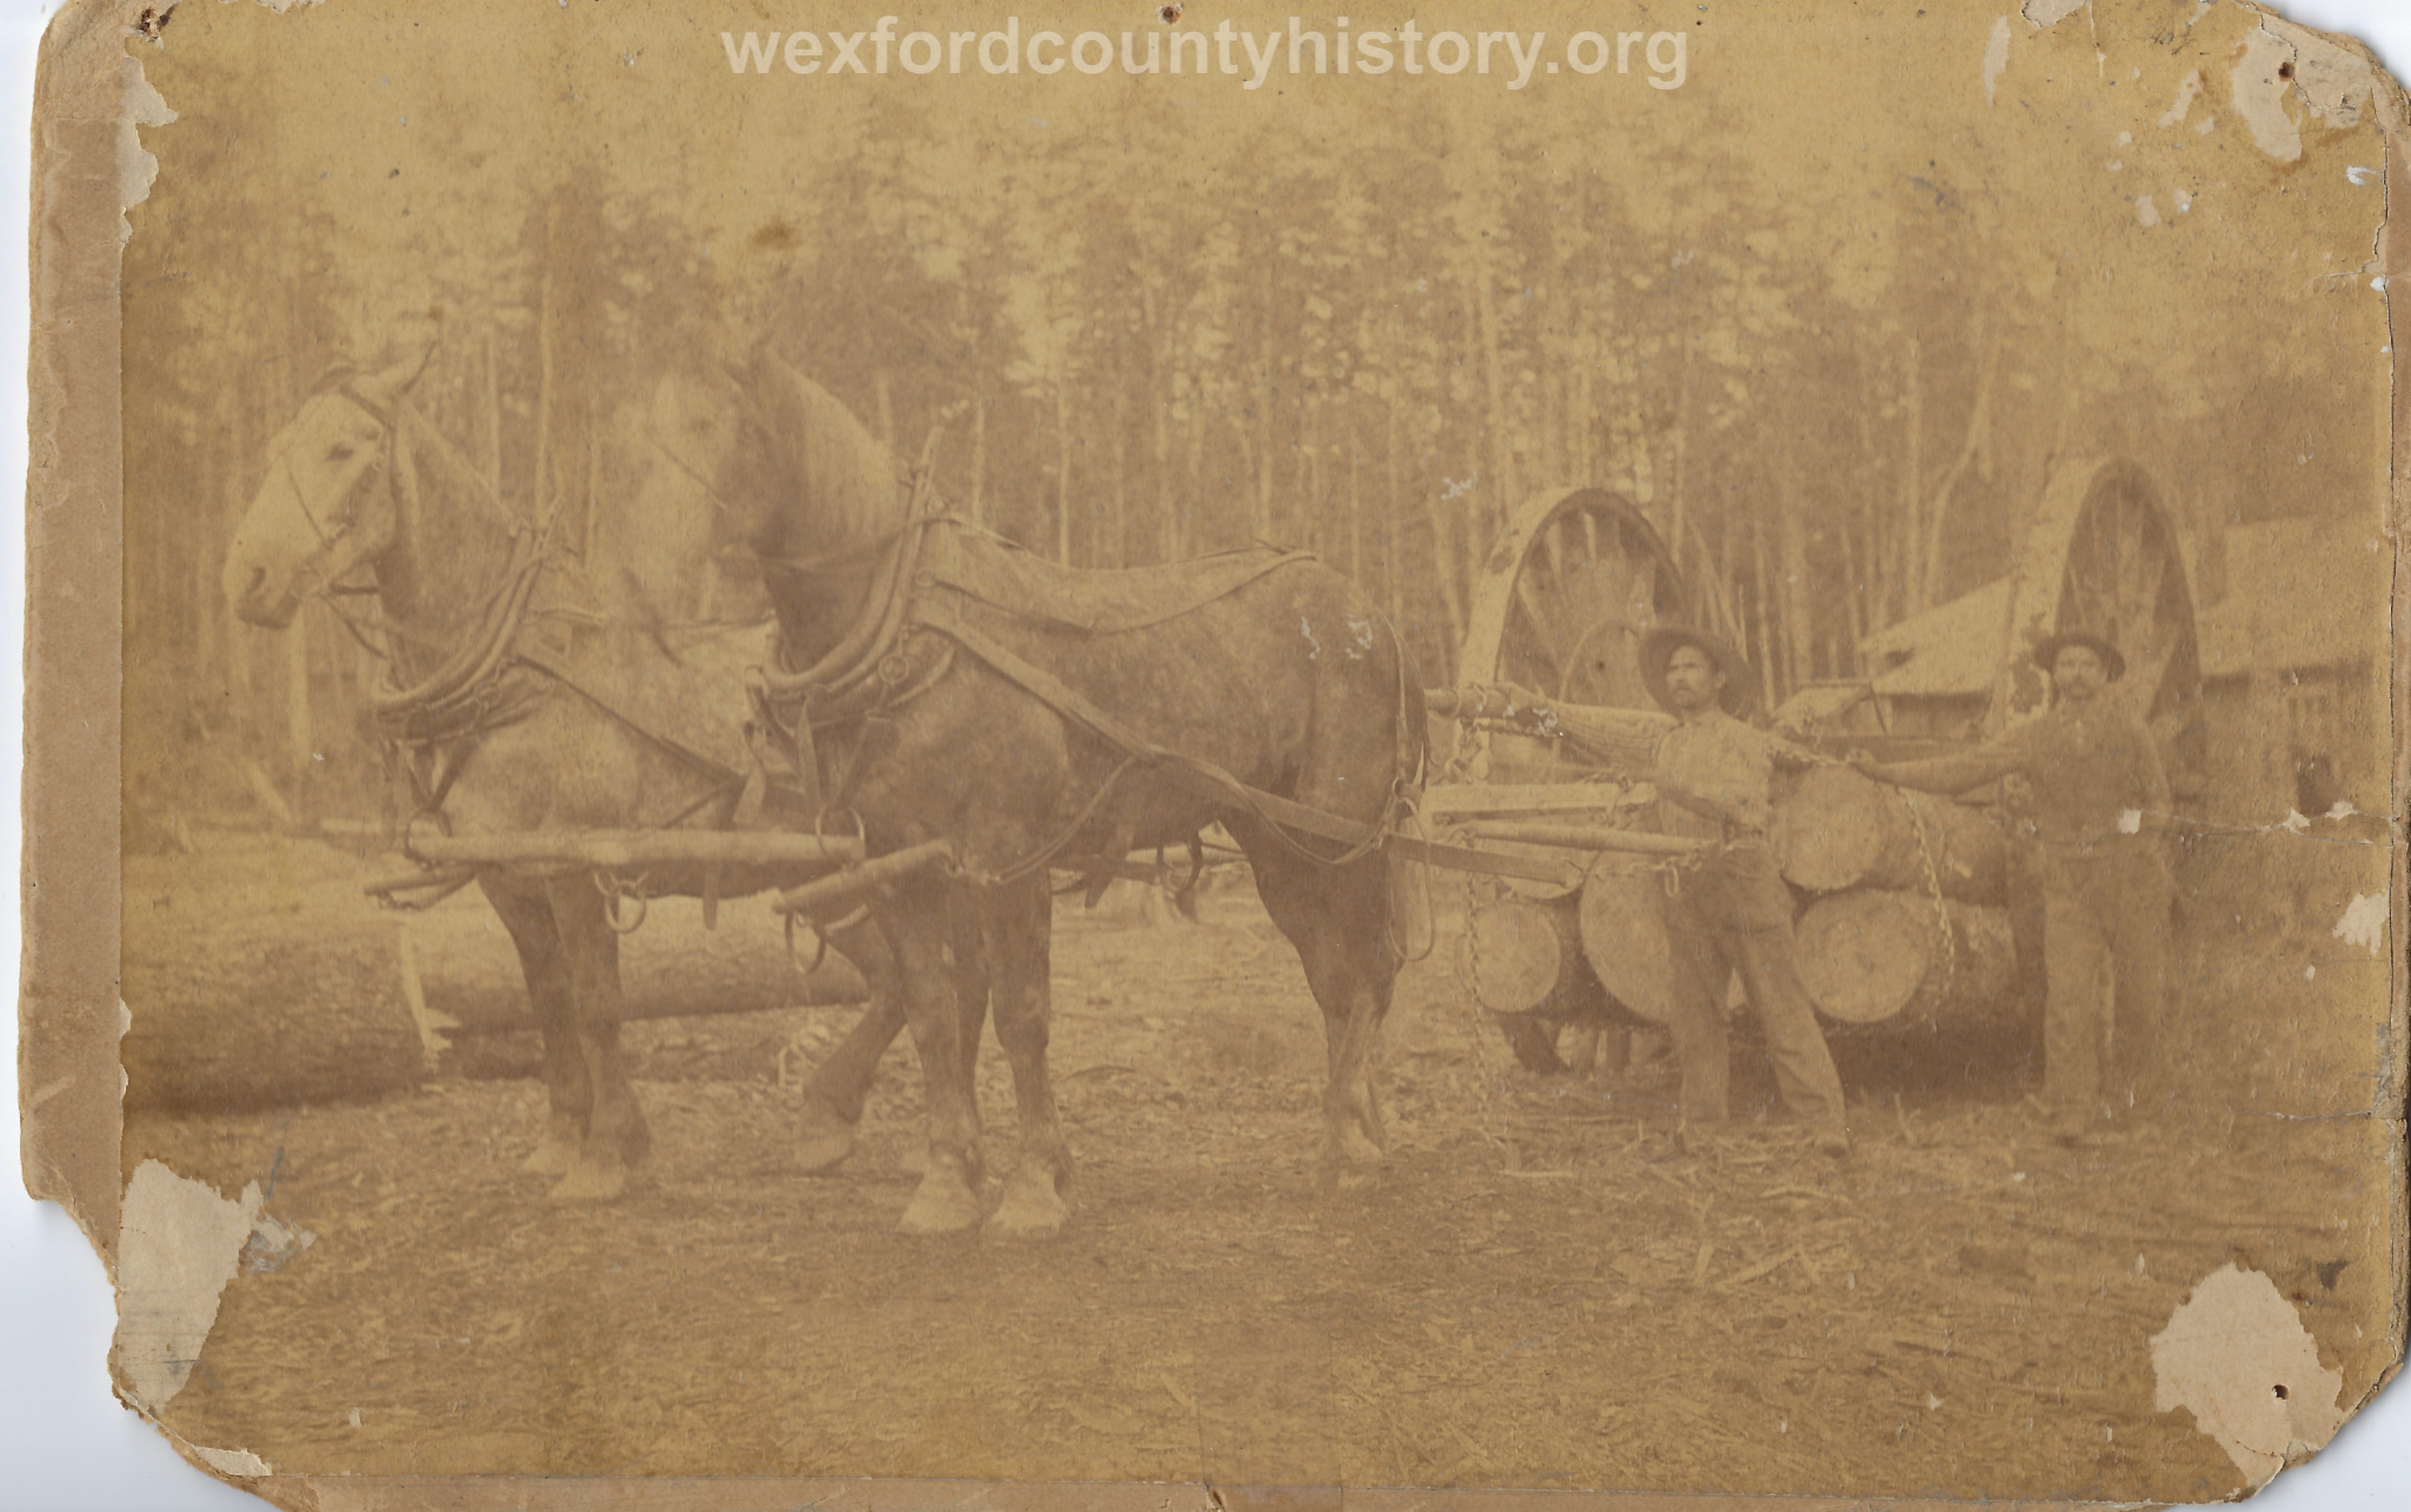 Cadillac-Lumber-Horse-Team-Pulling-Logs-2